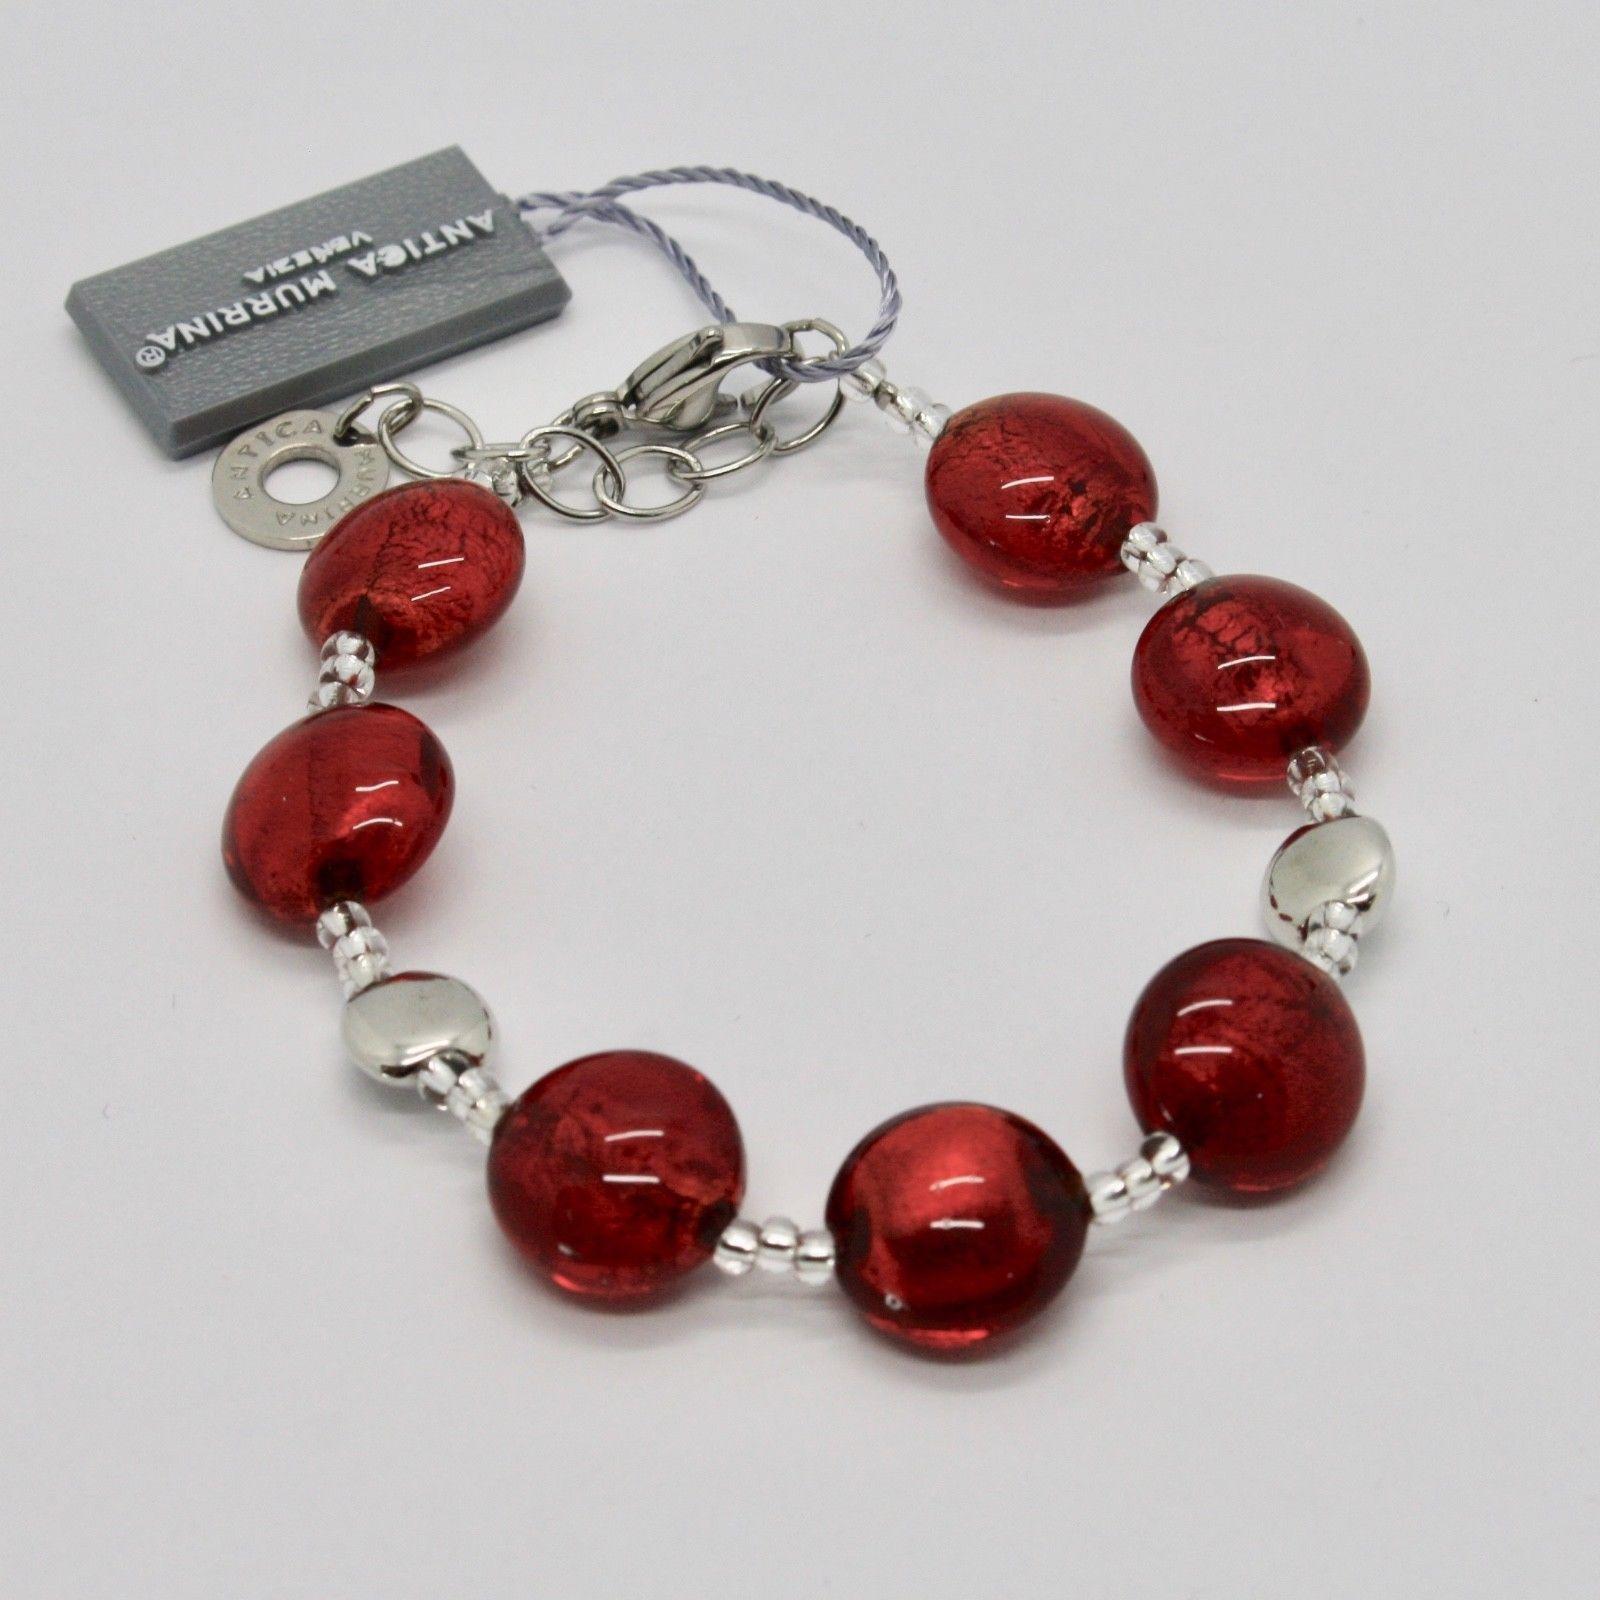 BRACELET ANTICA MURRINA VENEZIA WITH MURANO GLASS RED SILVER BR297A31